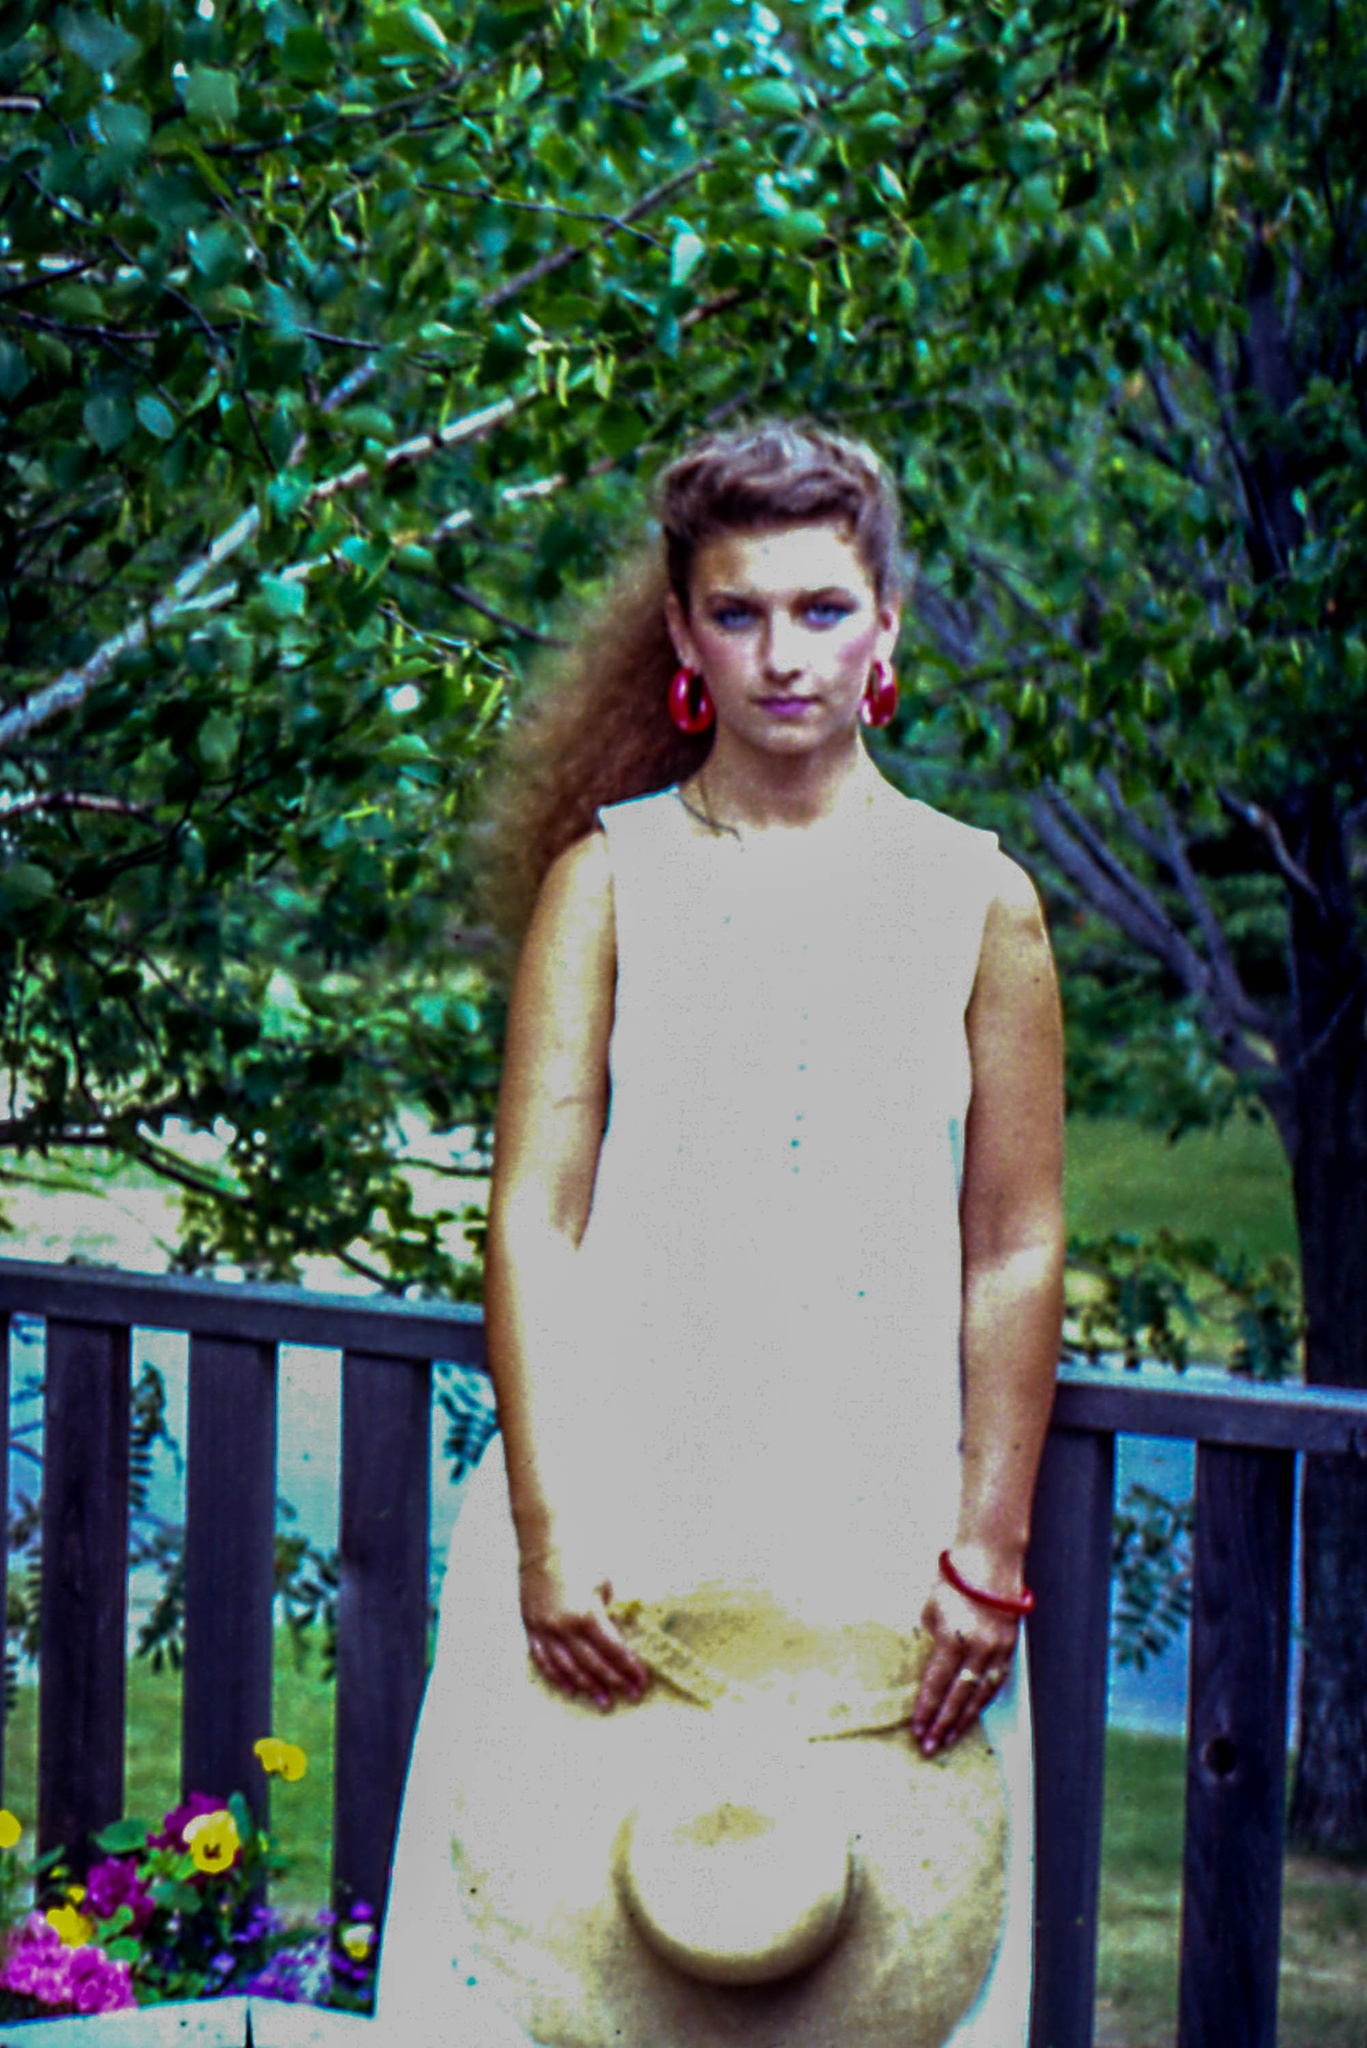 Lorinda by wes.johnson.58